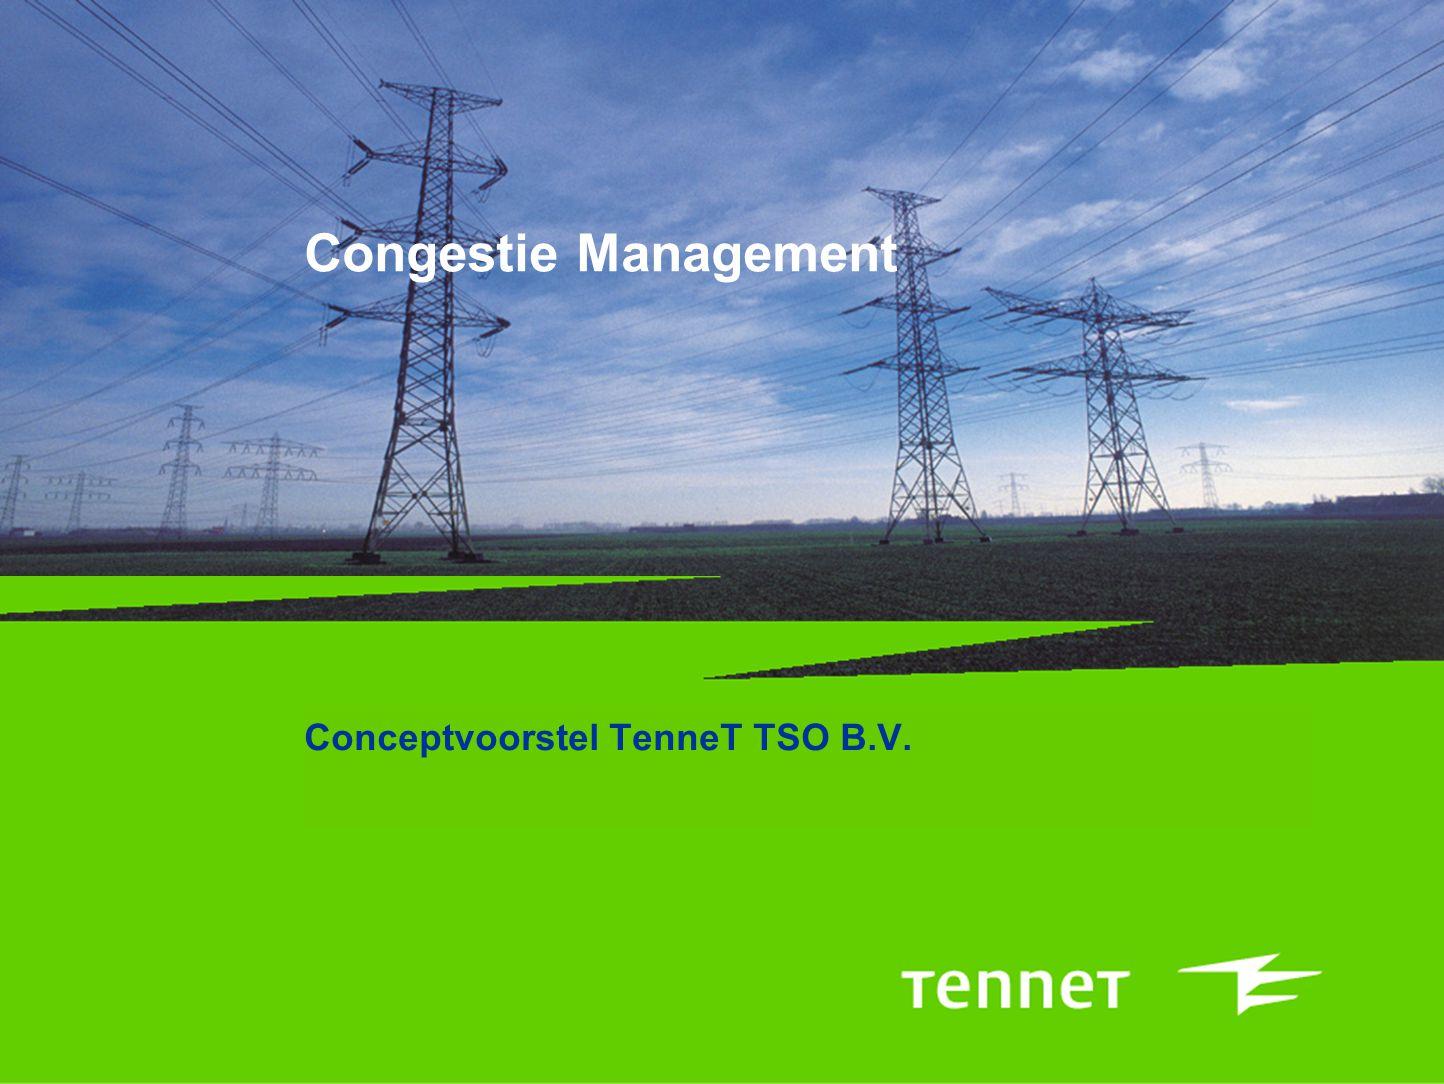 Congestie Management Conceptvoorstel TenneT TSO B.V.